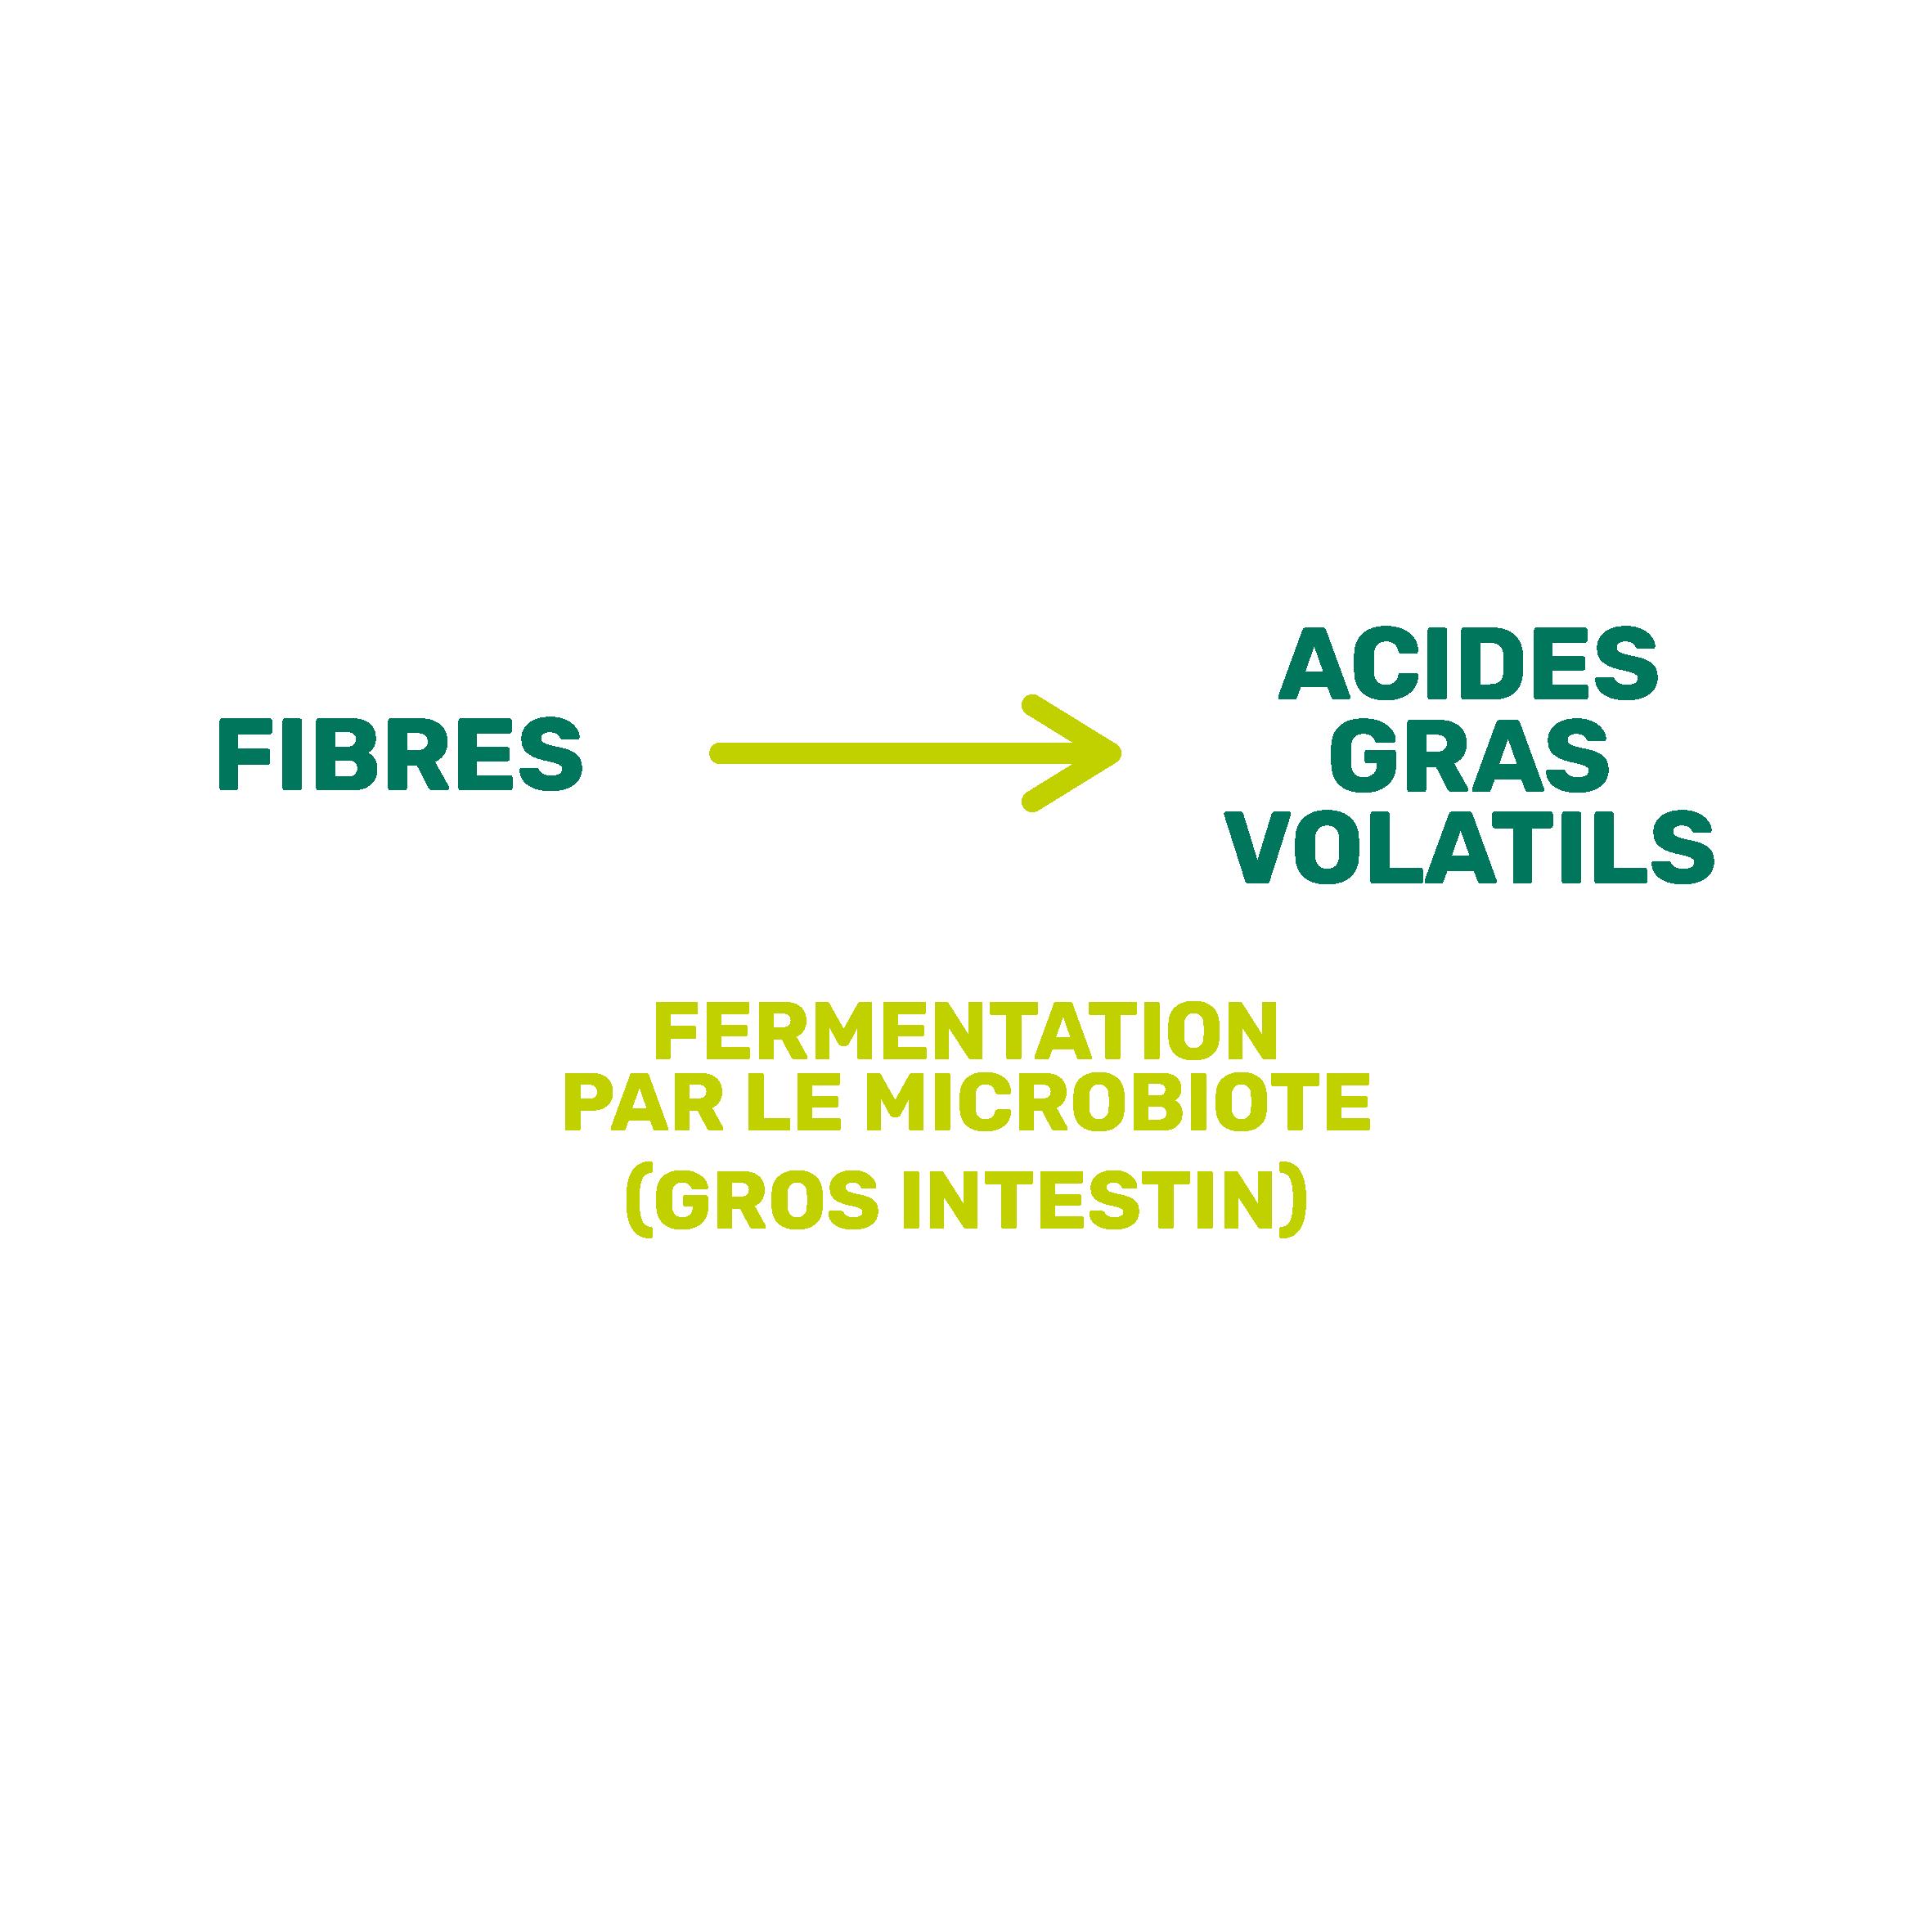 fibres acides gras volatils